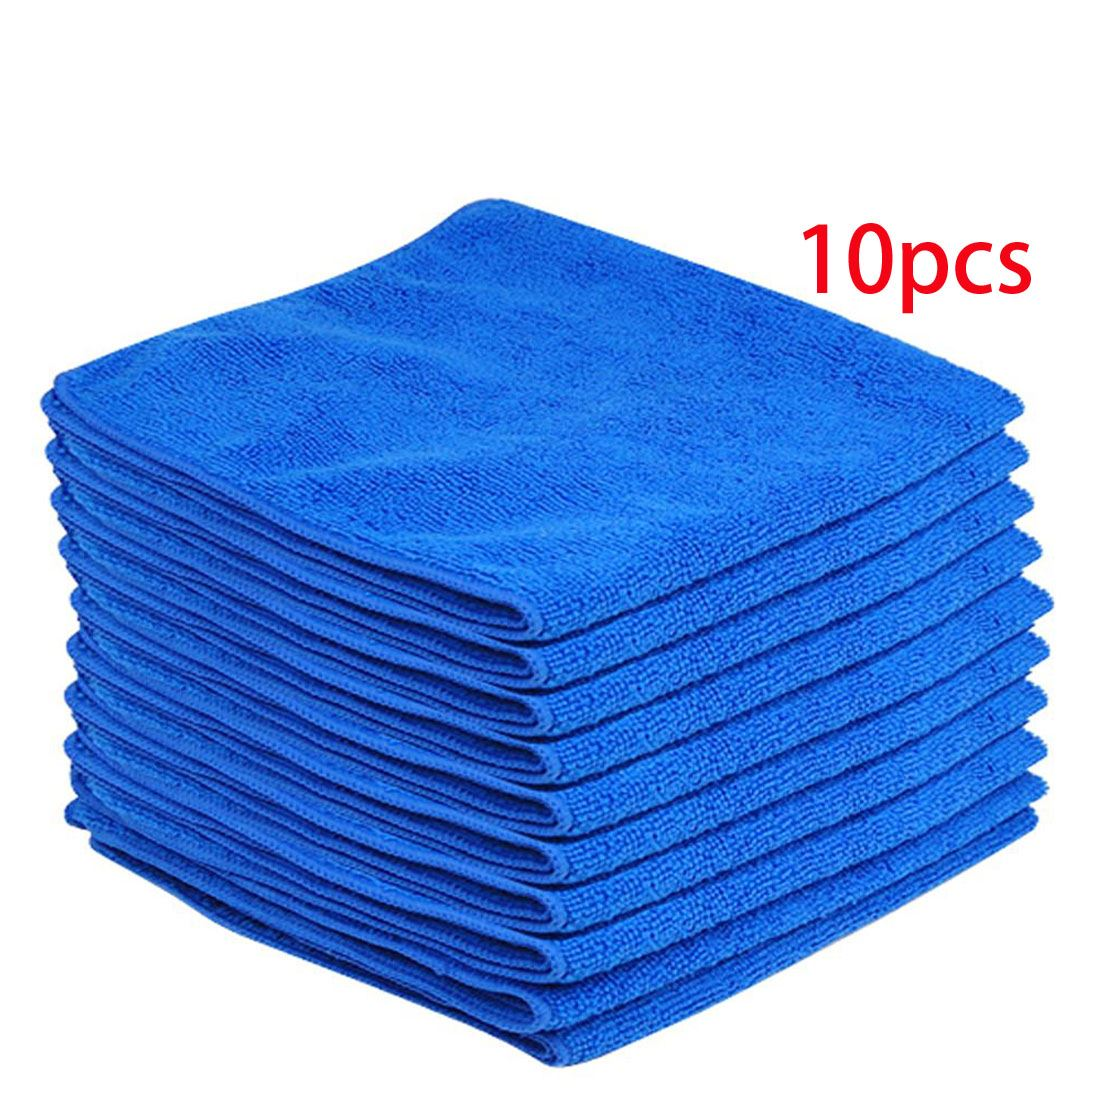 10x large microfiber cleaning auto car detailing soft cloth towel duster wash ebay. Black Bedroom Furniture Sets. Home Design Ideas